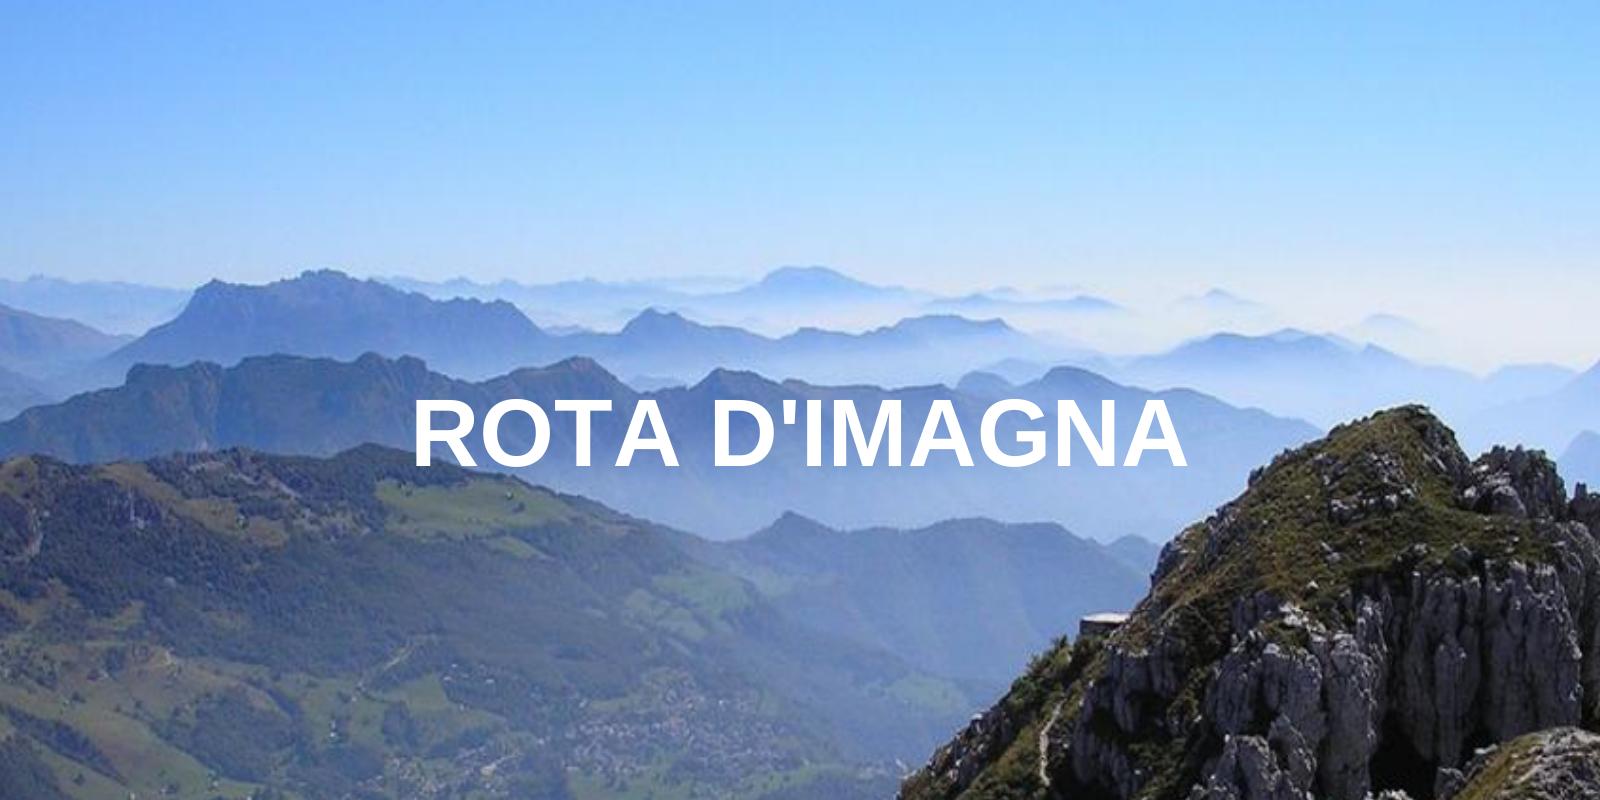 Vacanze Assistite per Anziani in Lombardia, a Rota d ...